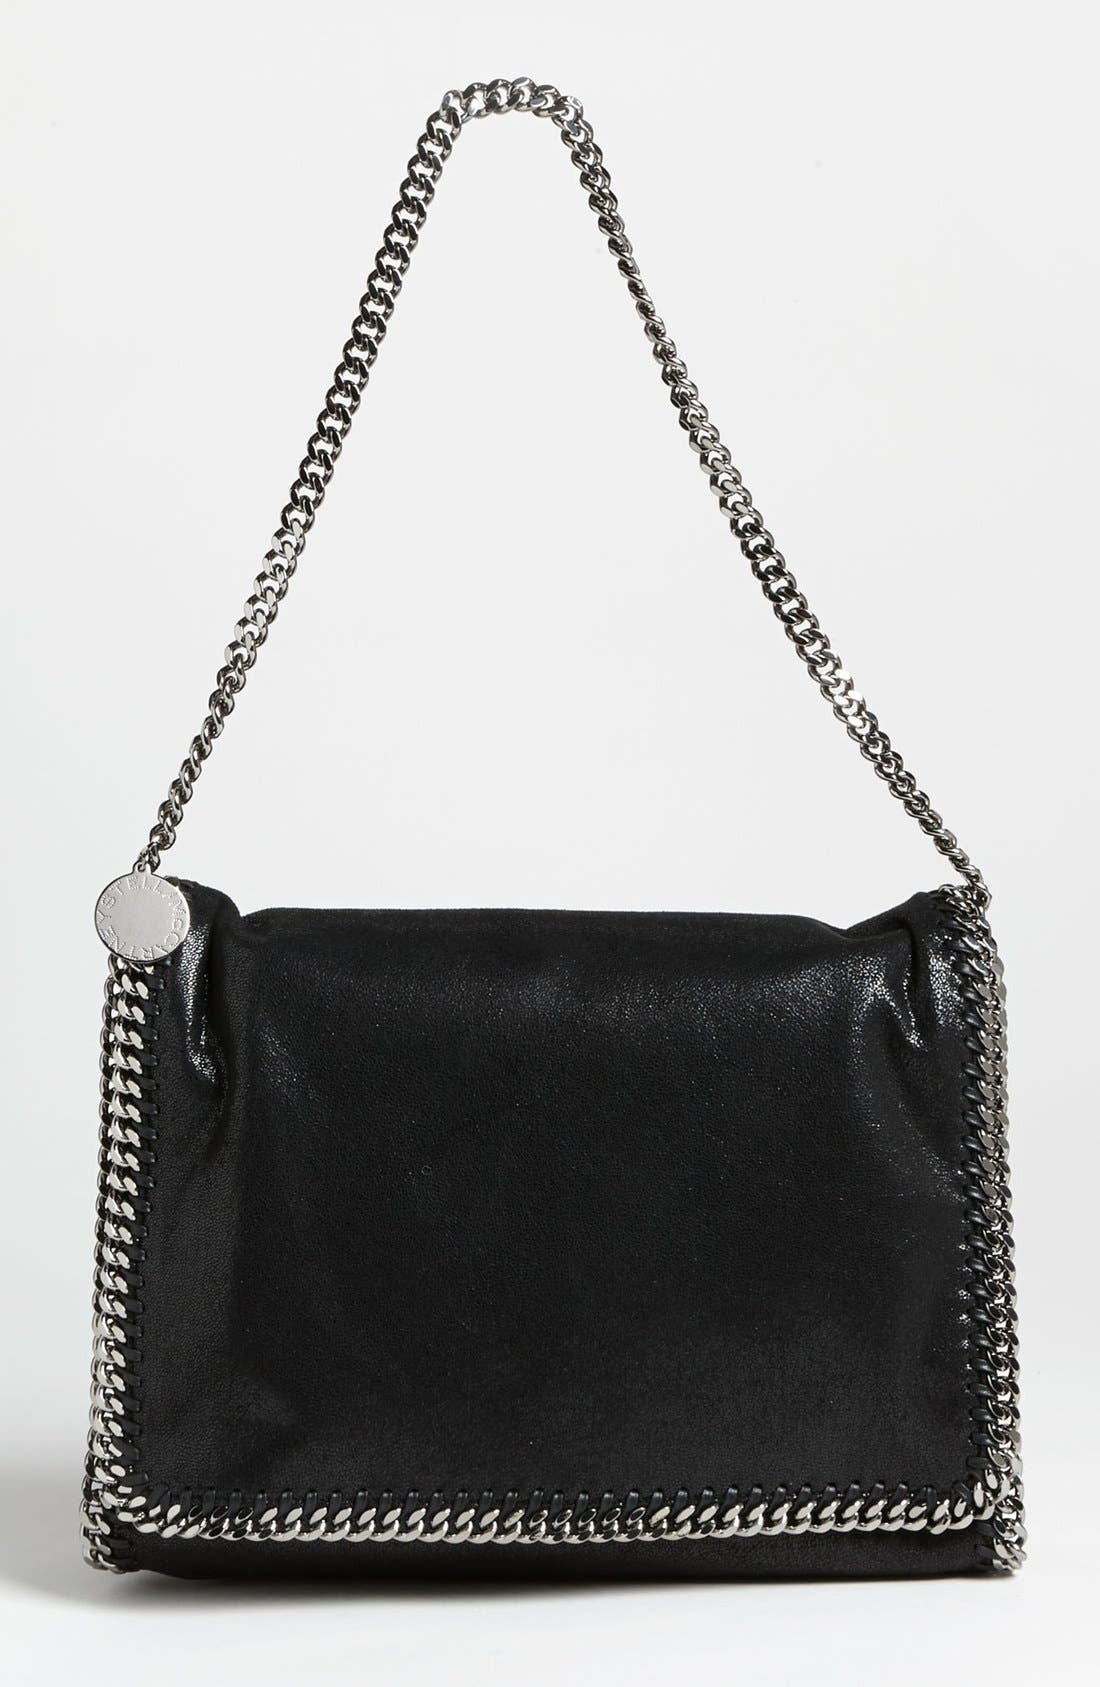 Main Image - Stella McCartney 'Falabella - Big' Faux Suede Shoulder Bag